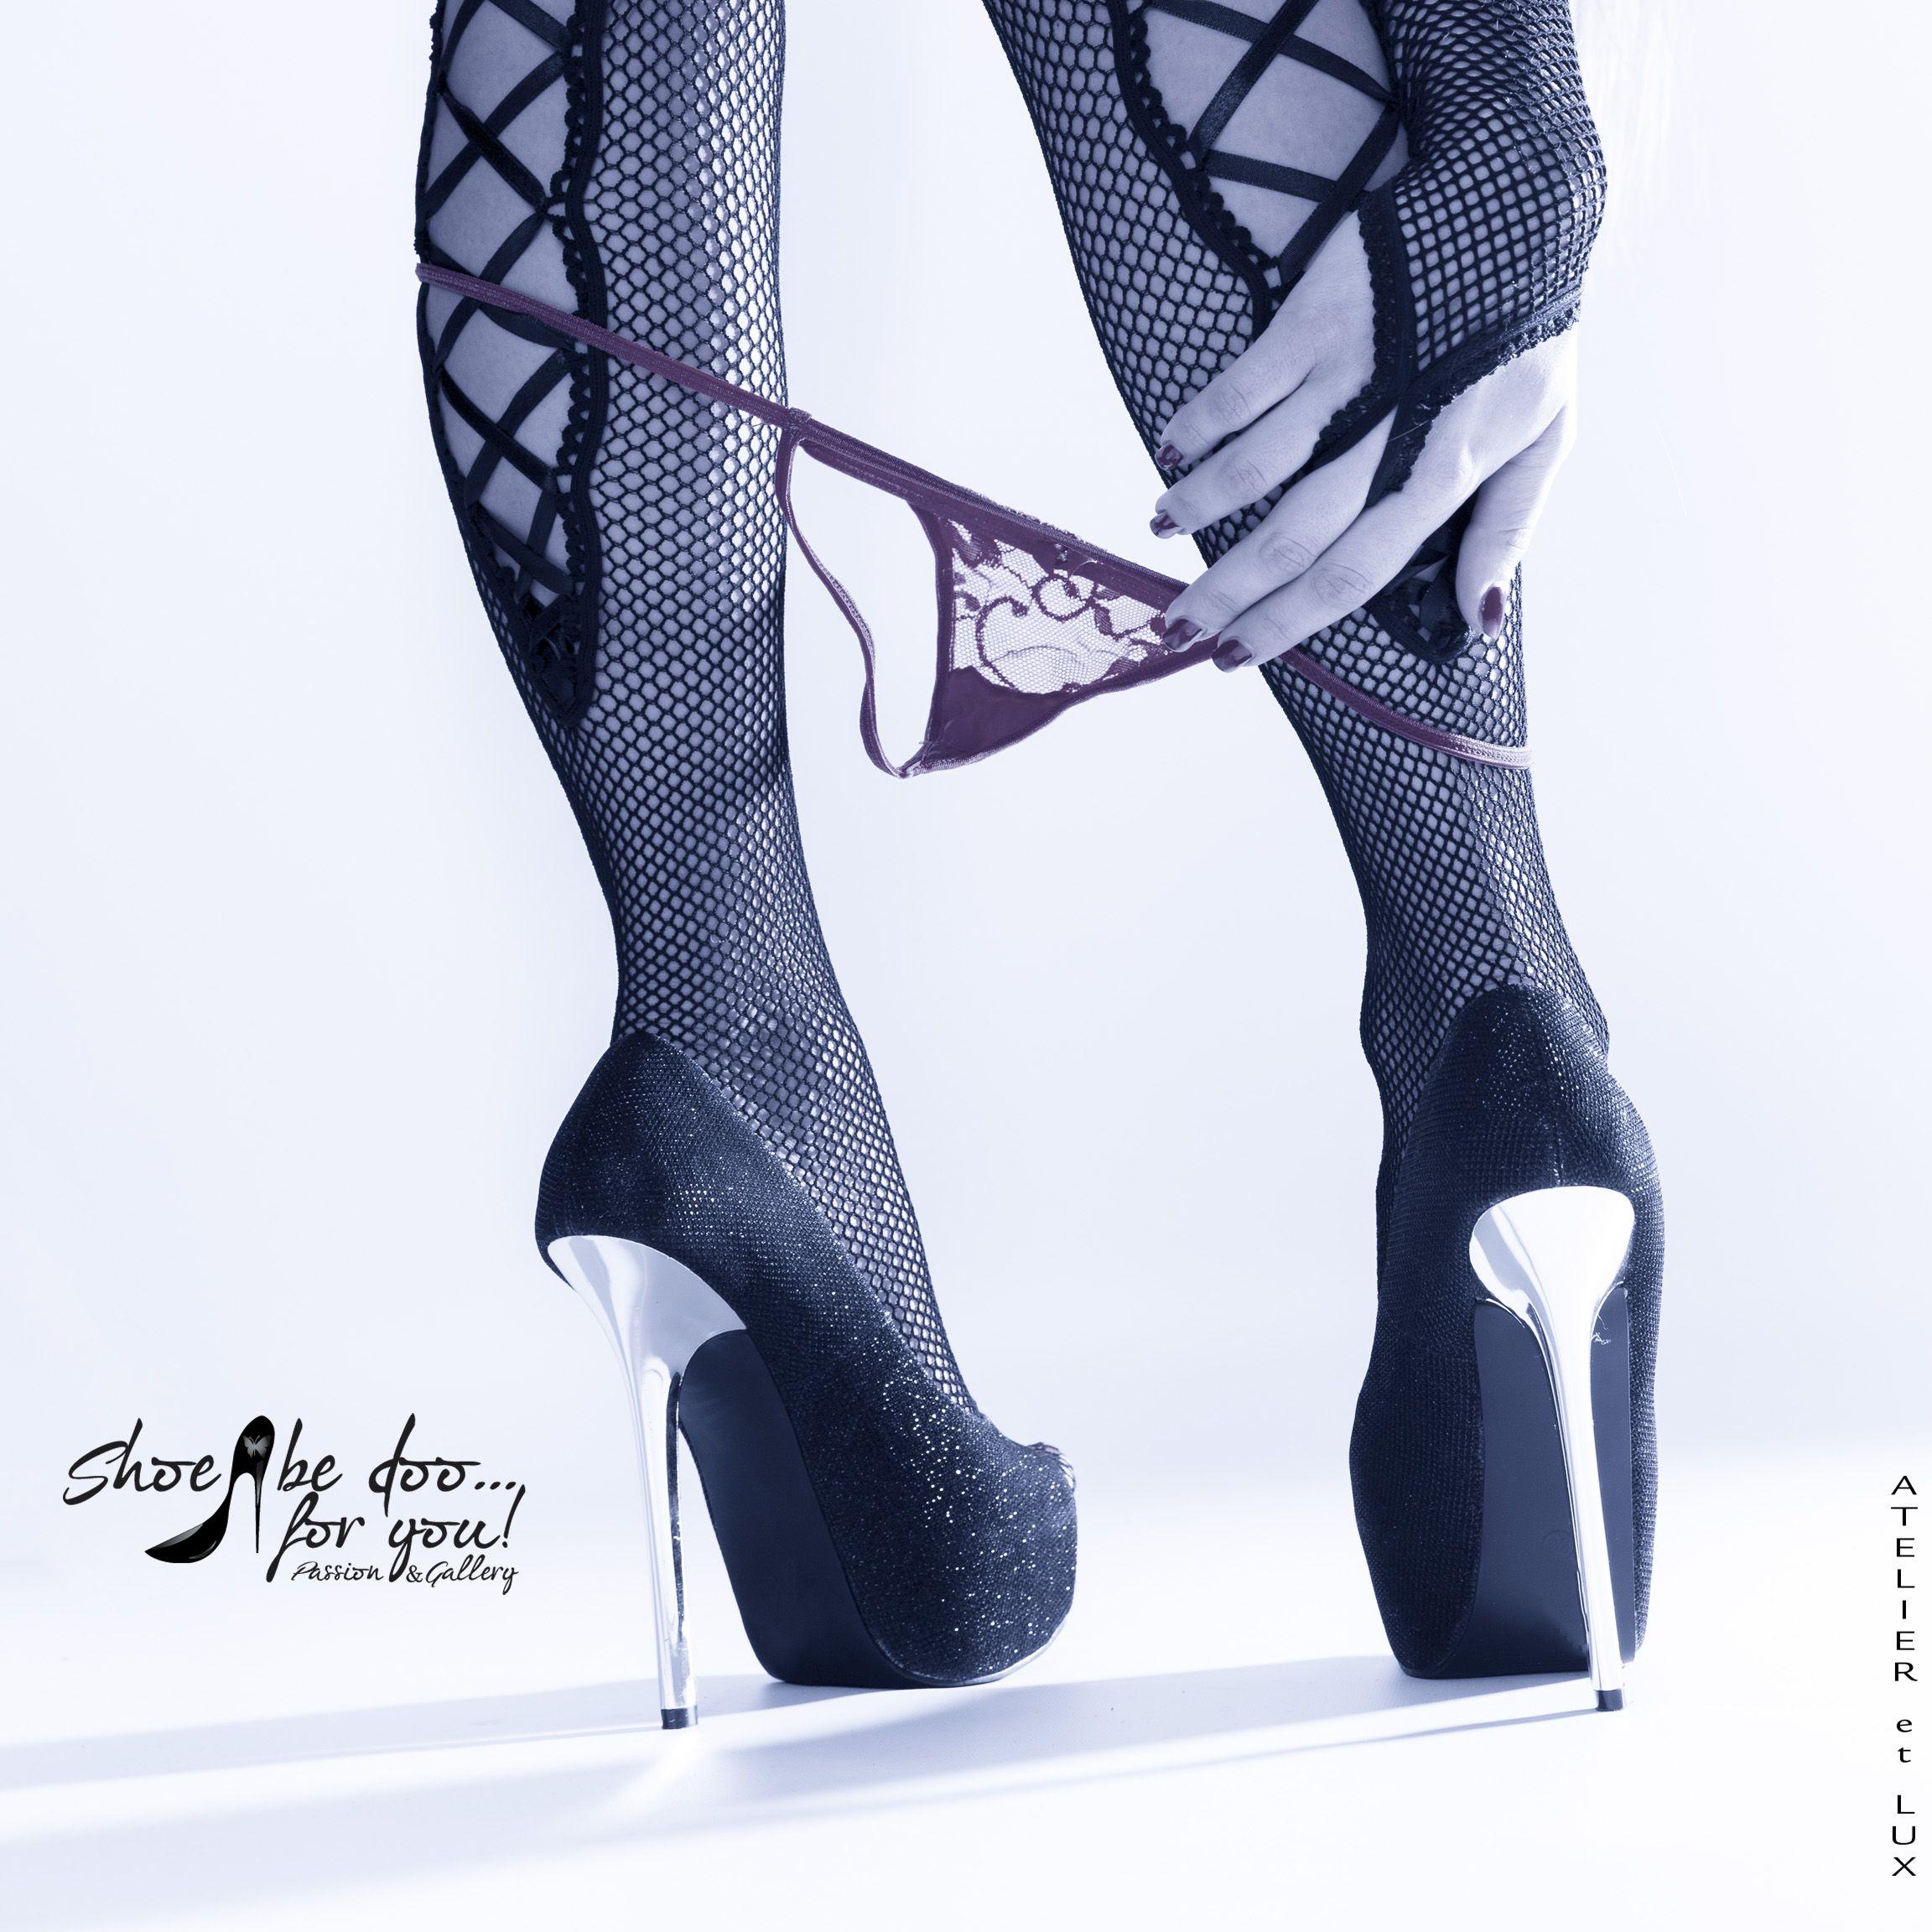 Session 'Shoe Calendar Part I' Photography: Atelier 'et Lux' Model: Jessica, Dessous: baci Lingerie | Style No. 175-M | White Label Collection | Lace G-String W/Bow & saresia | Netzstrumpfhose mit auffälliger Schnürung | schwarz